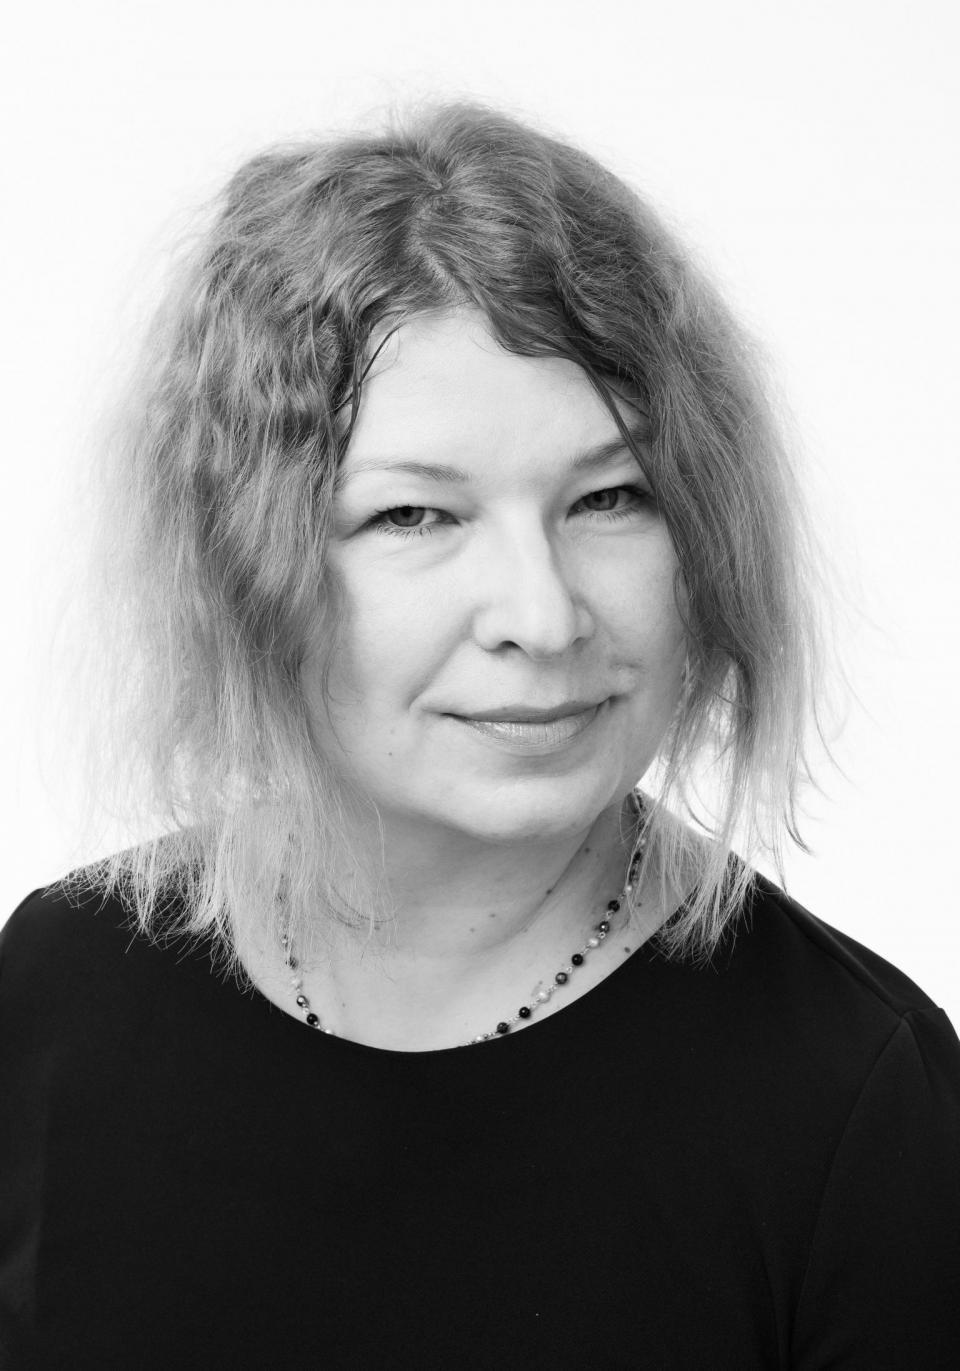 Annika Visnapuu